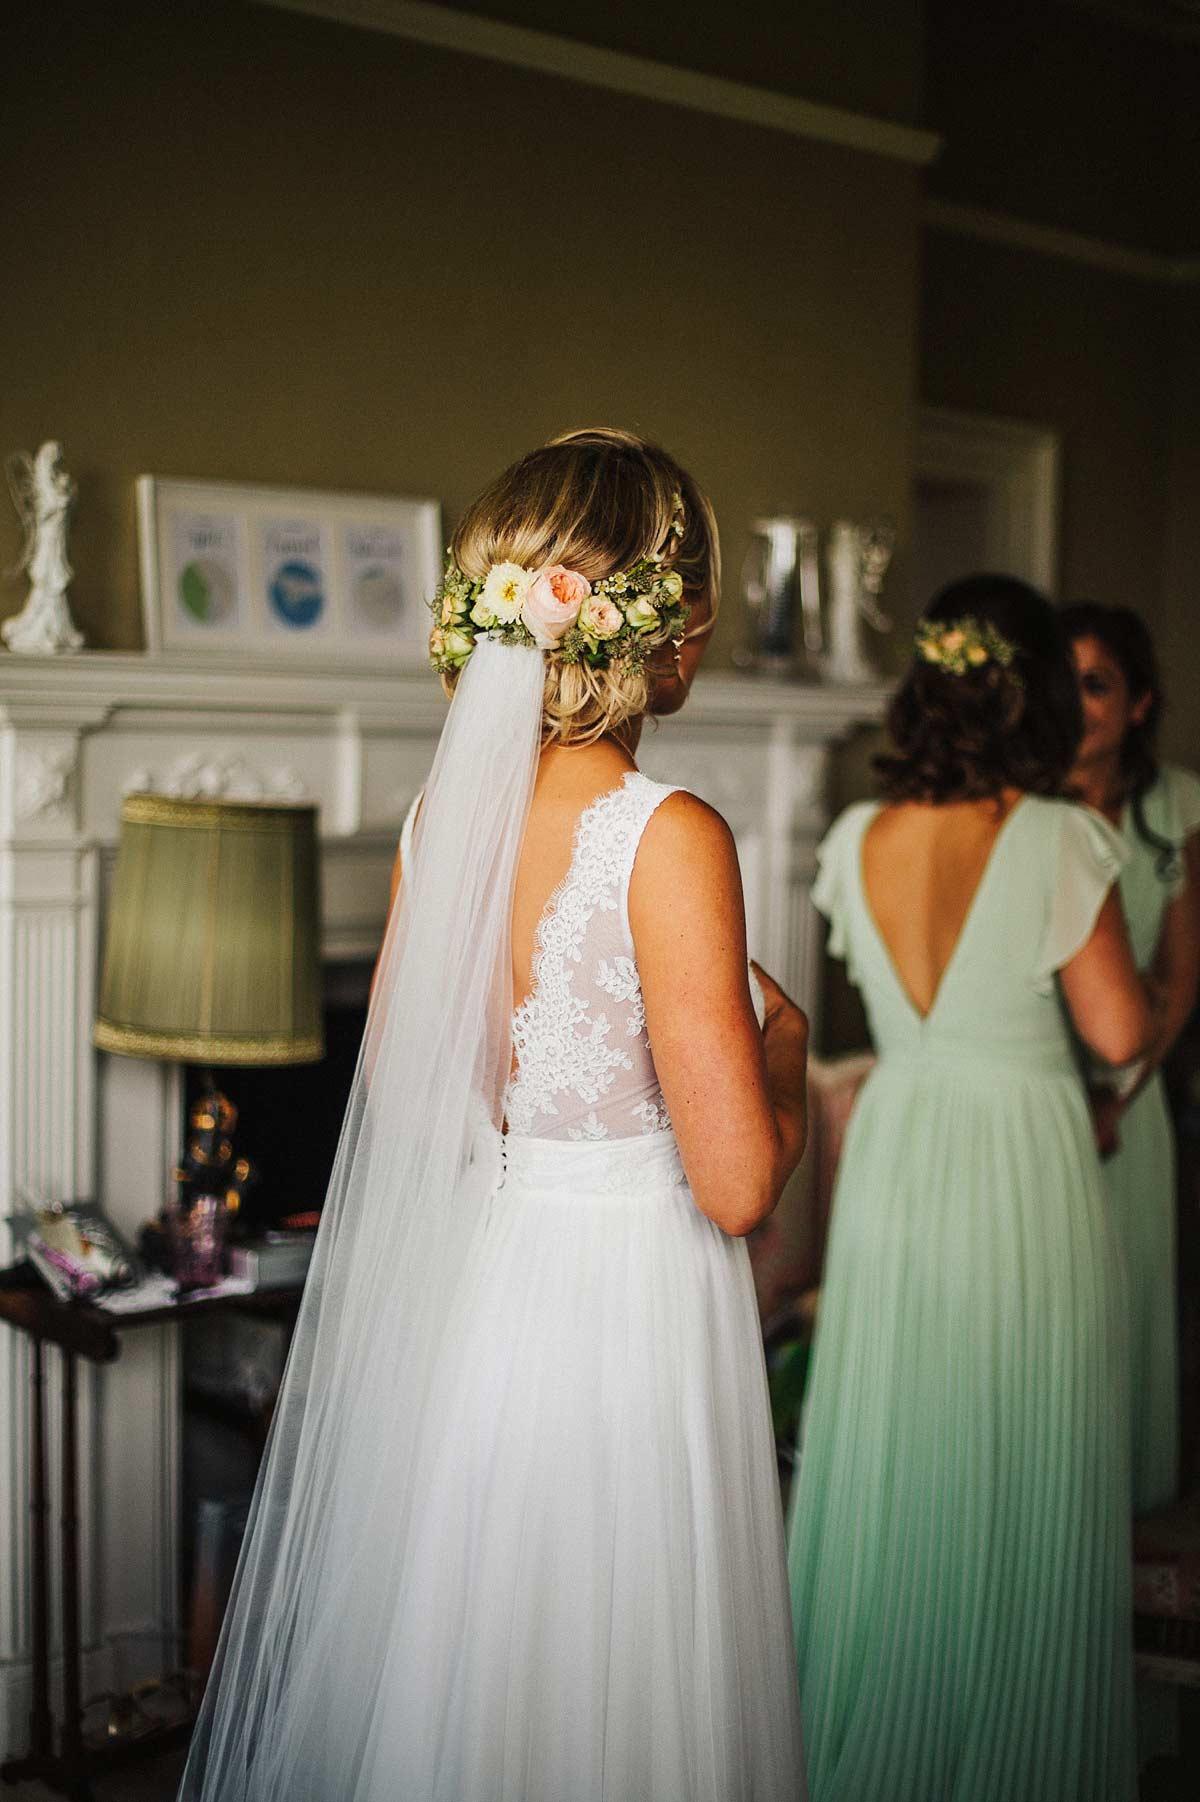 Beautiful wedding hair and flowers